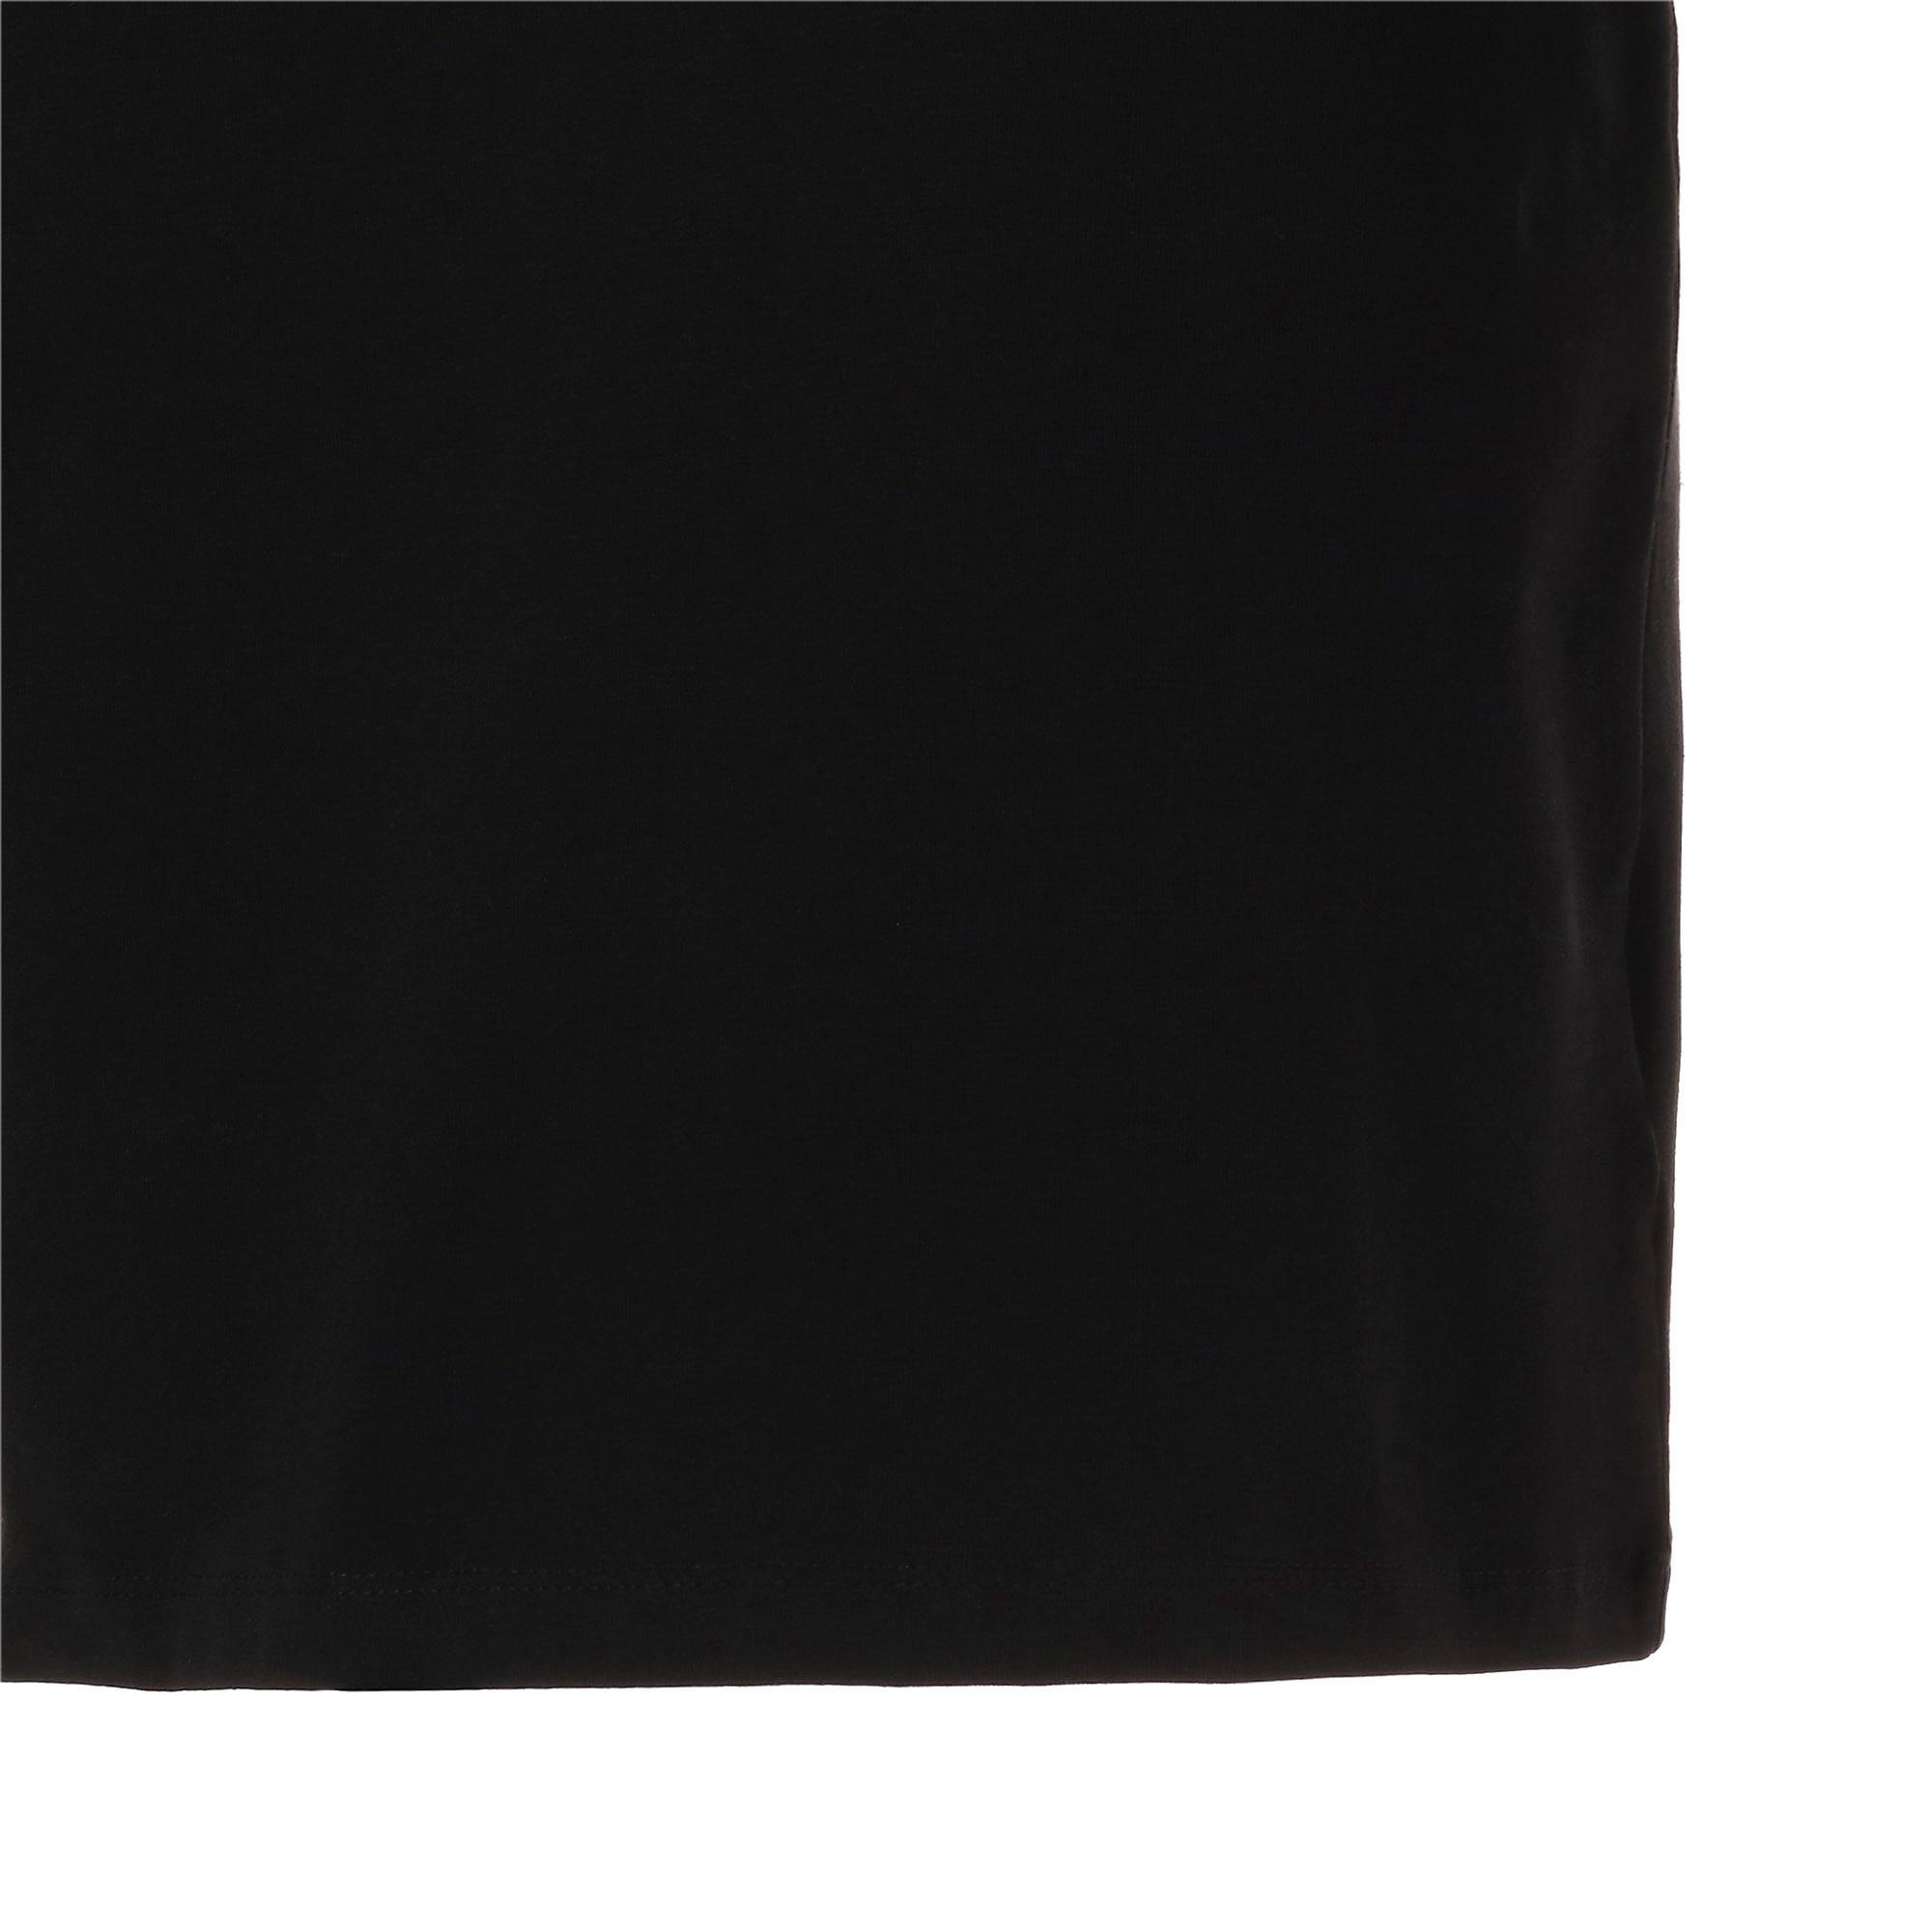 Thumbnail 9 of CLASSICS ウィメンズ ドレス, Cotton Black, medium-JPN